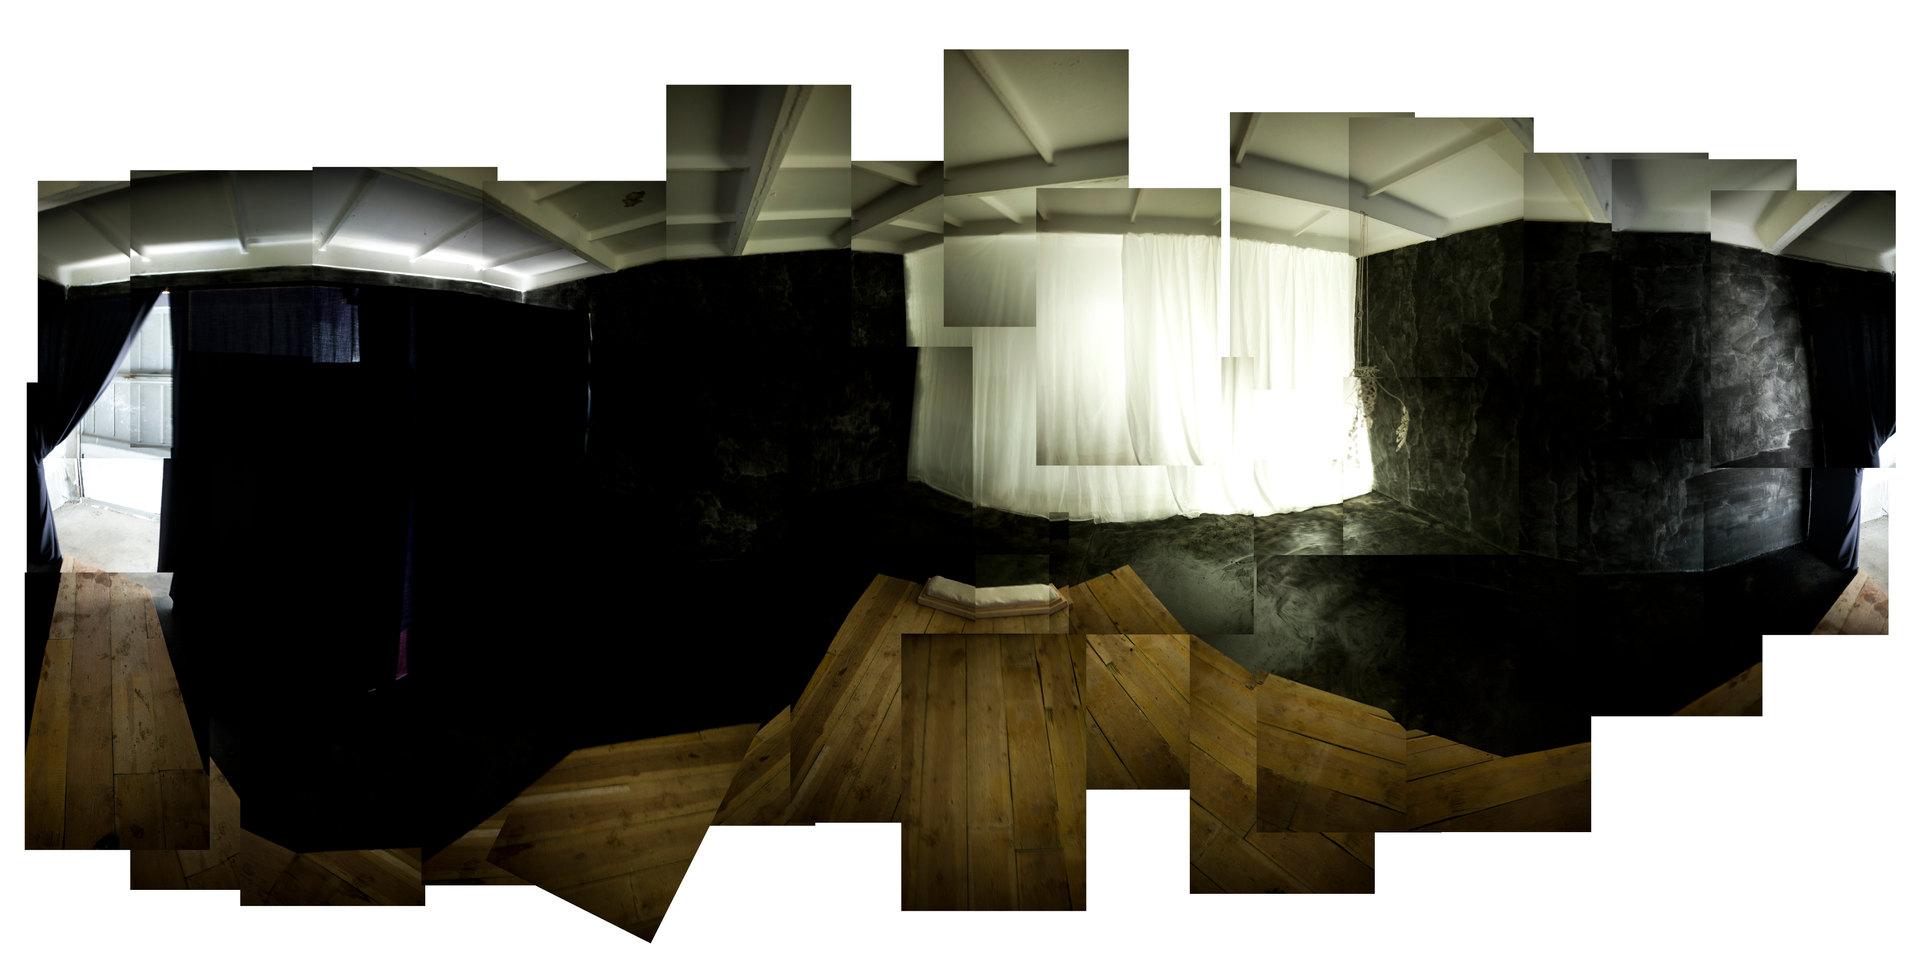 Garage_panorama.jpg